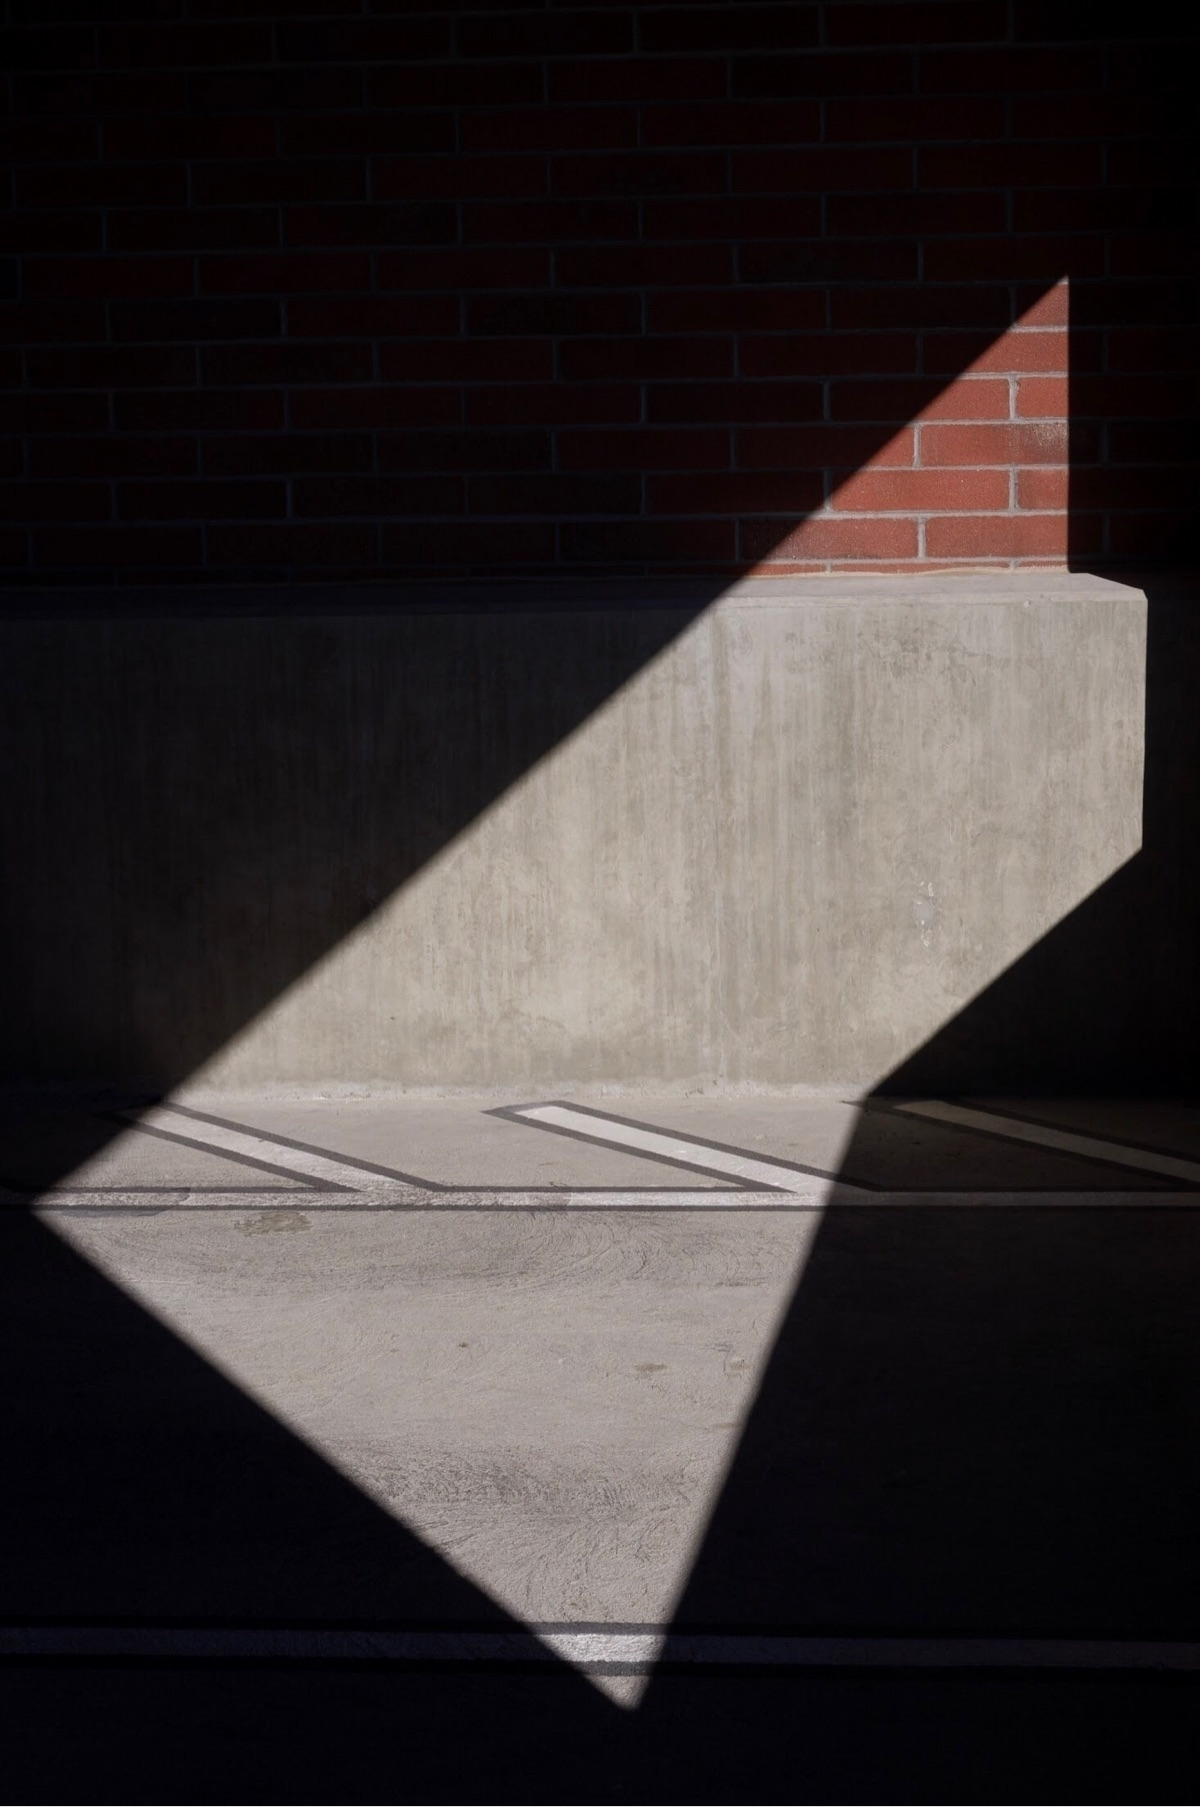 Abstraction - ellophotography, newtopography - danschumannmraz   ello